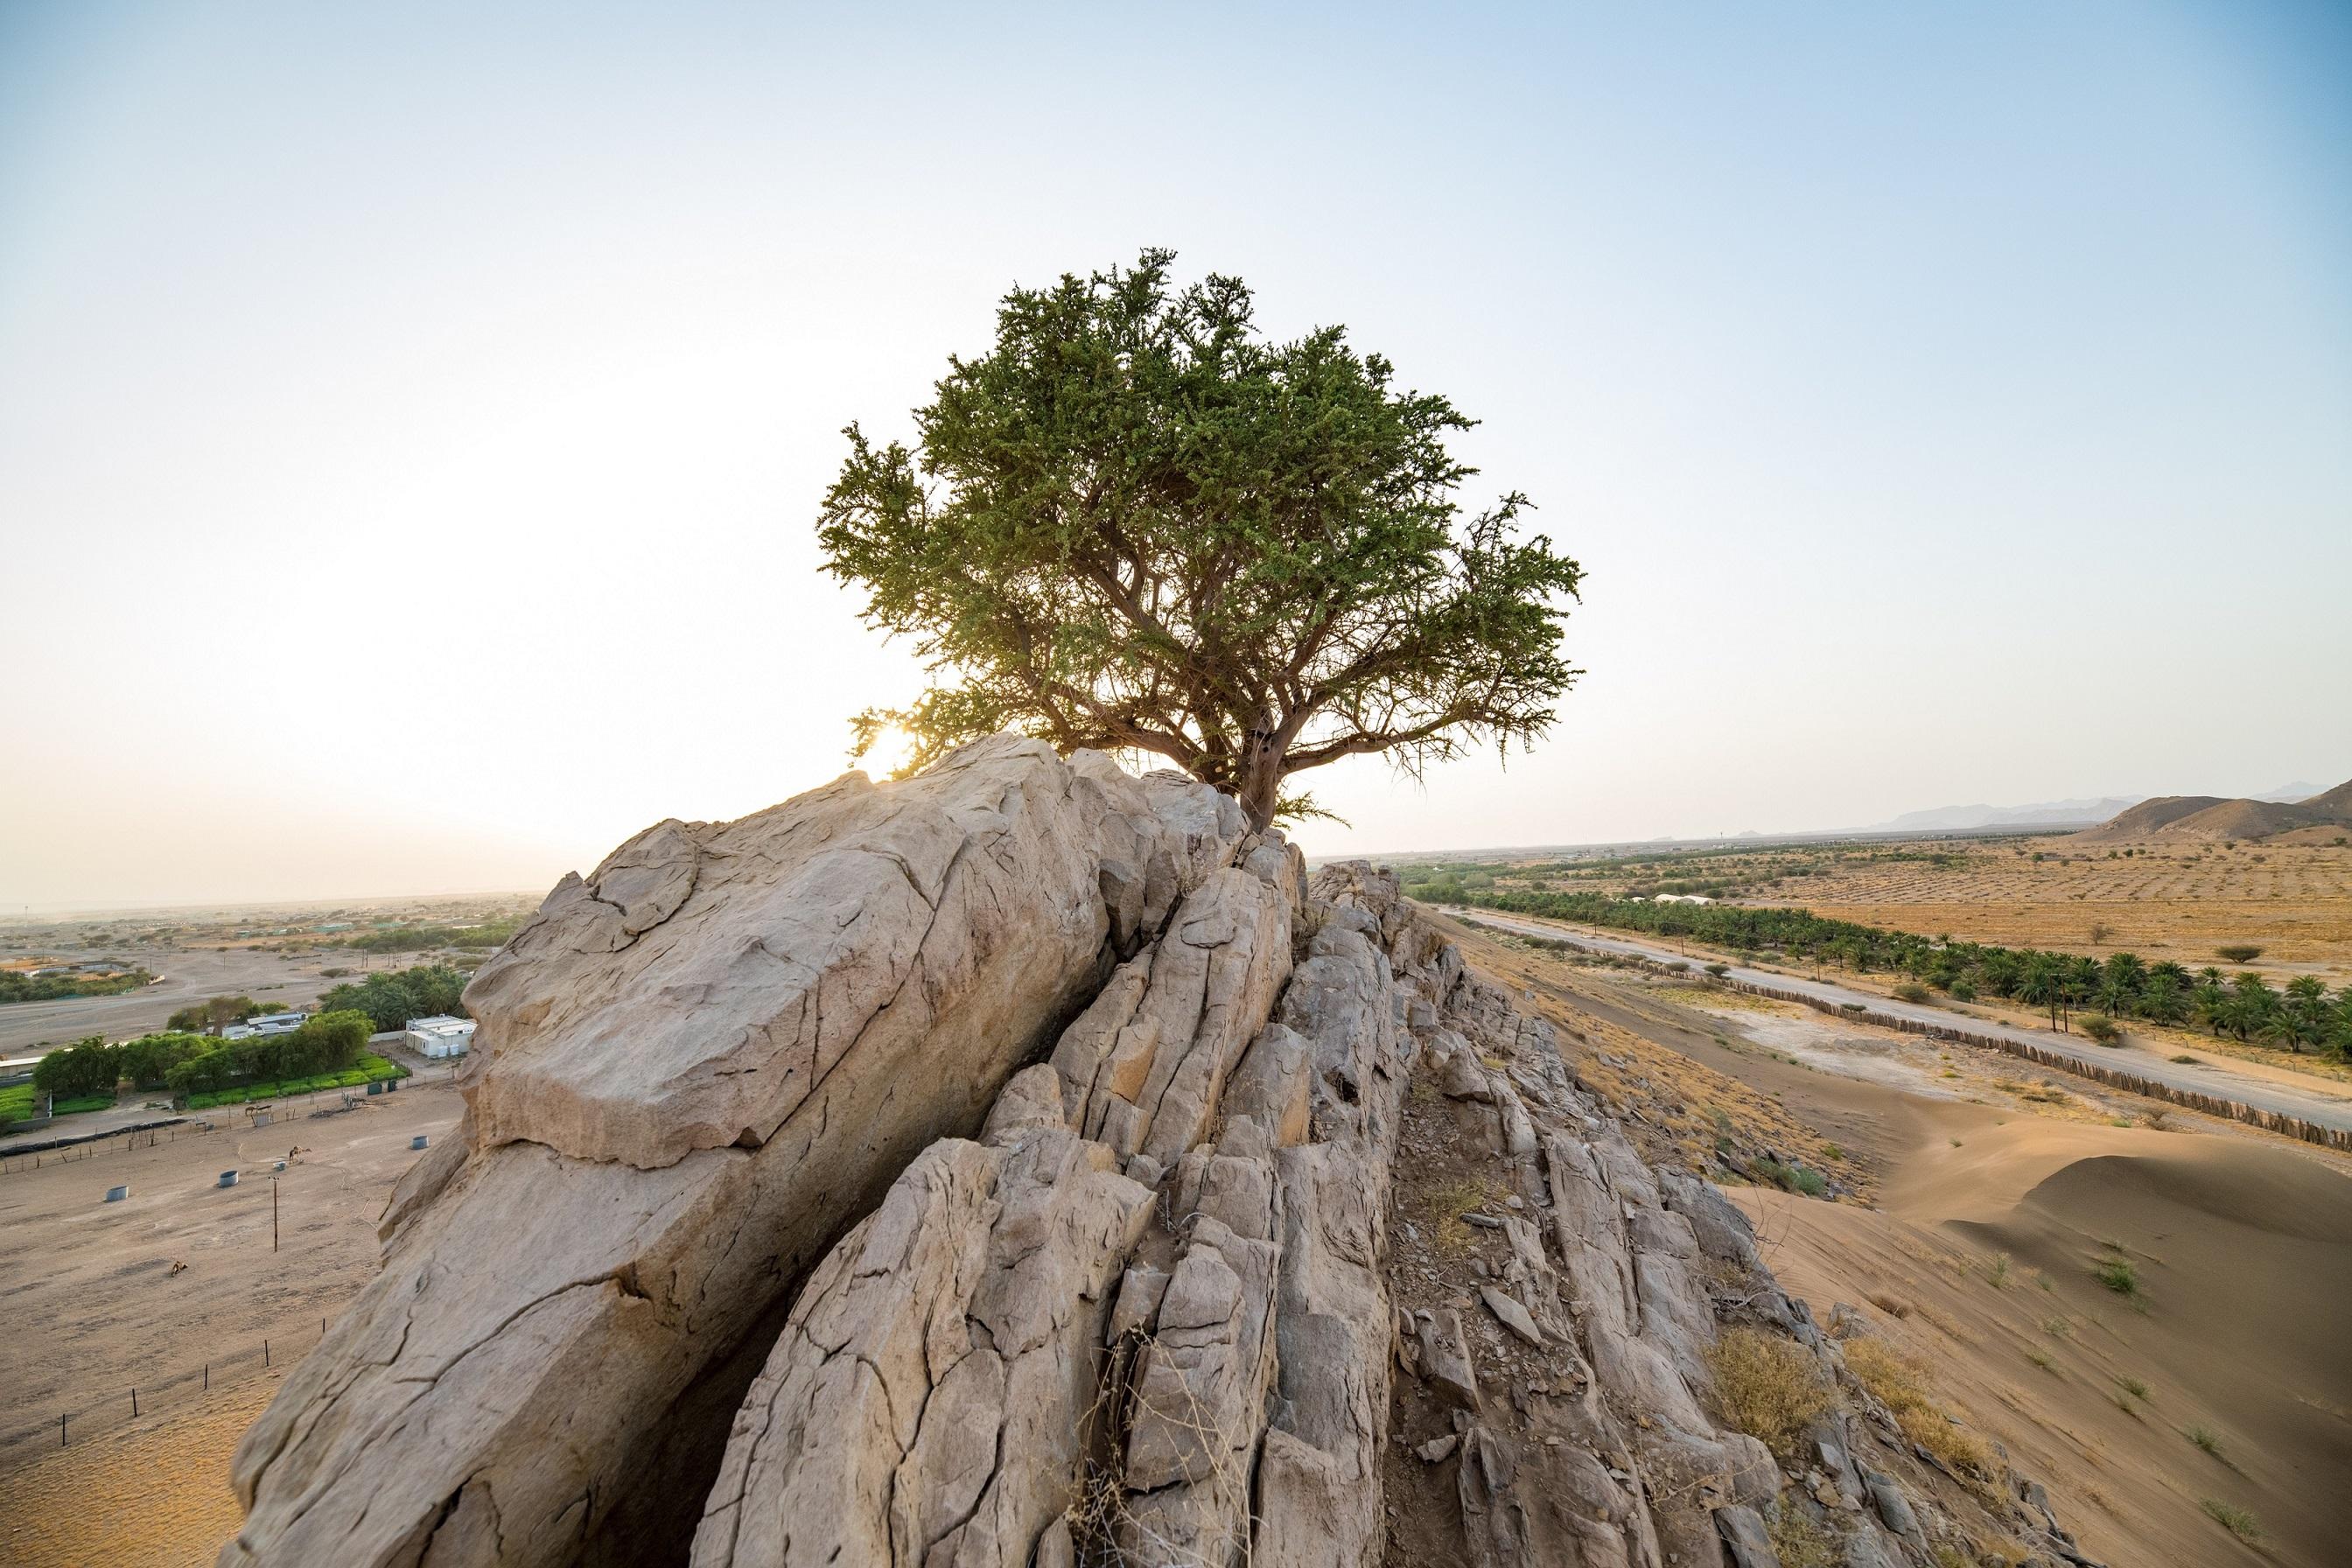 al-sarh tree in malakat